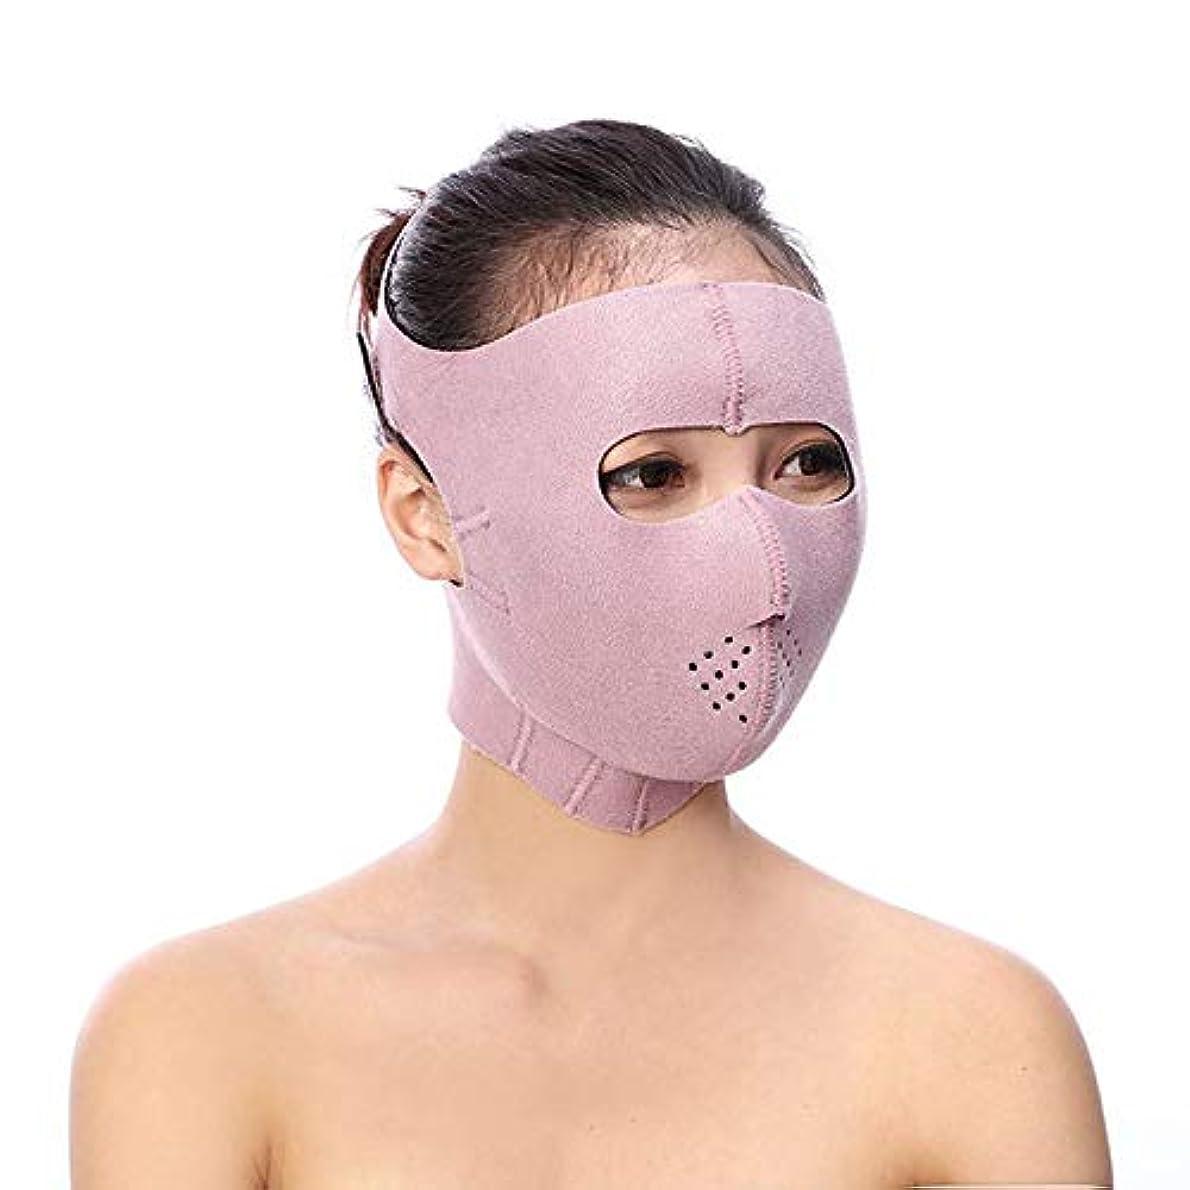 XINGZHE フェイシャルリフティング痩身ベルト - Vフェイス包帯マスクフェイシャルマッサージャー無料の薄いフェイス包帯整形マスクを引き締める顔と首の顔スリム フェイスリフティングベルト